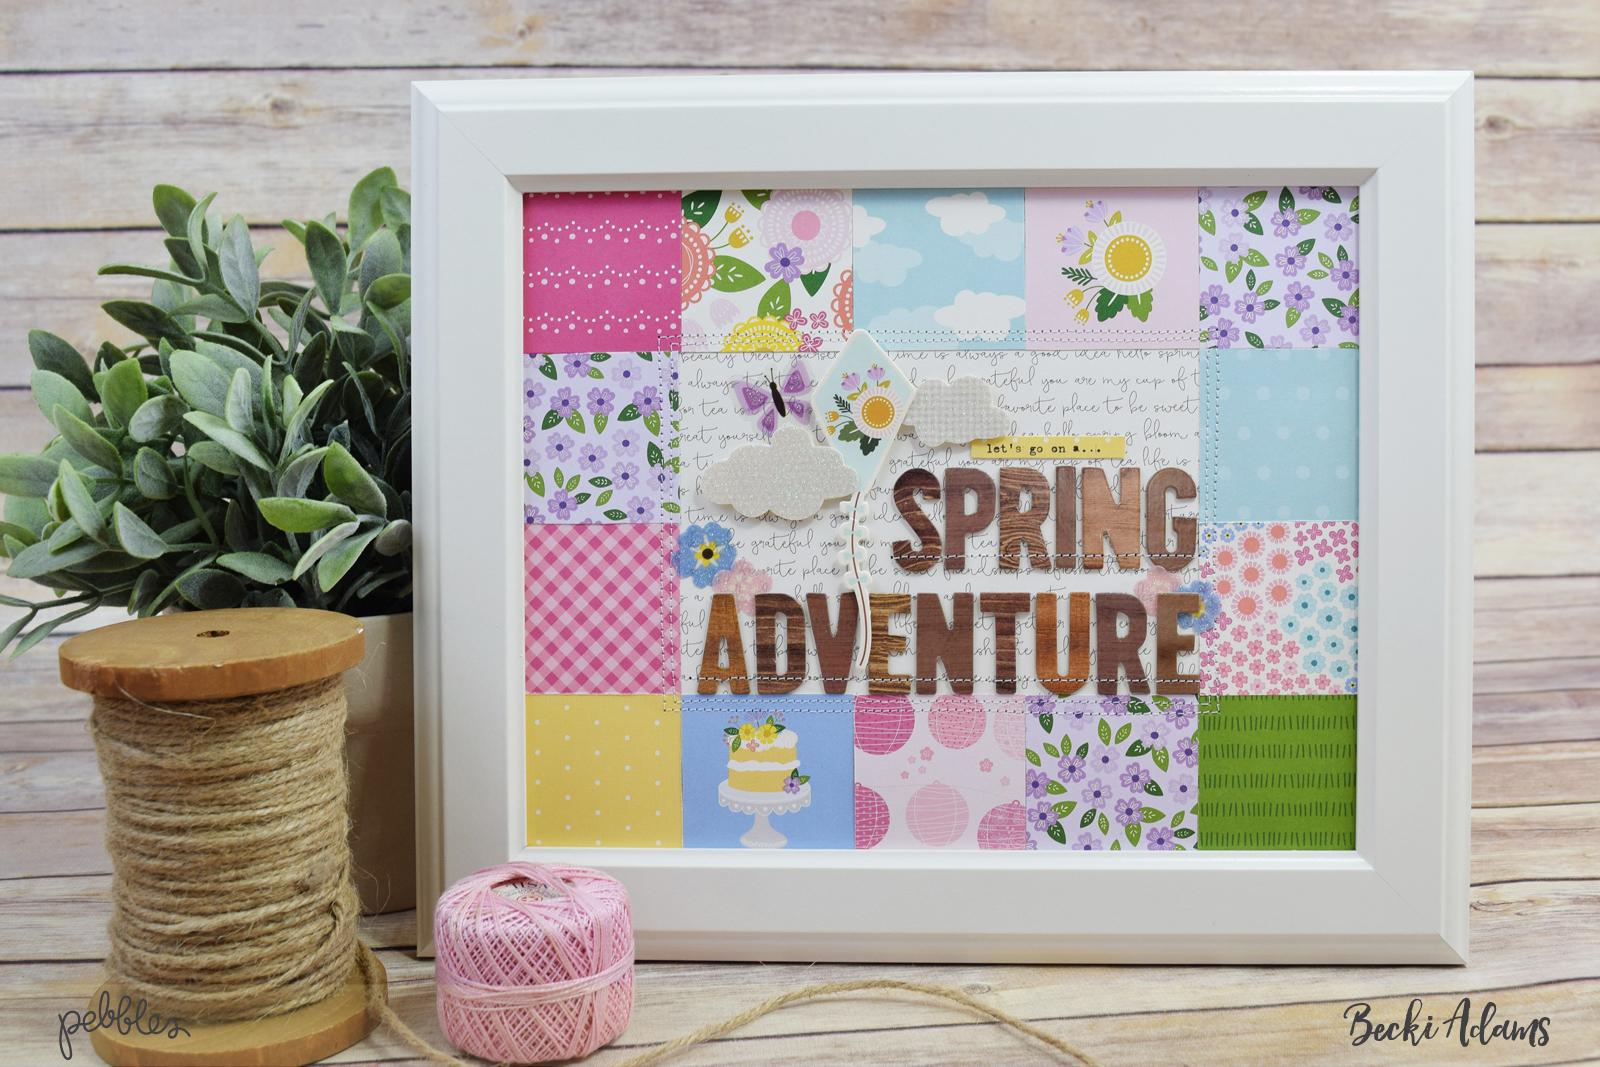 DIY Spring Home Decor created by @jbckadams for @Pebblesinc #DIYSpringHomeDecor #papercrafting #Pebblesinc